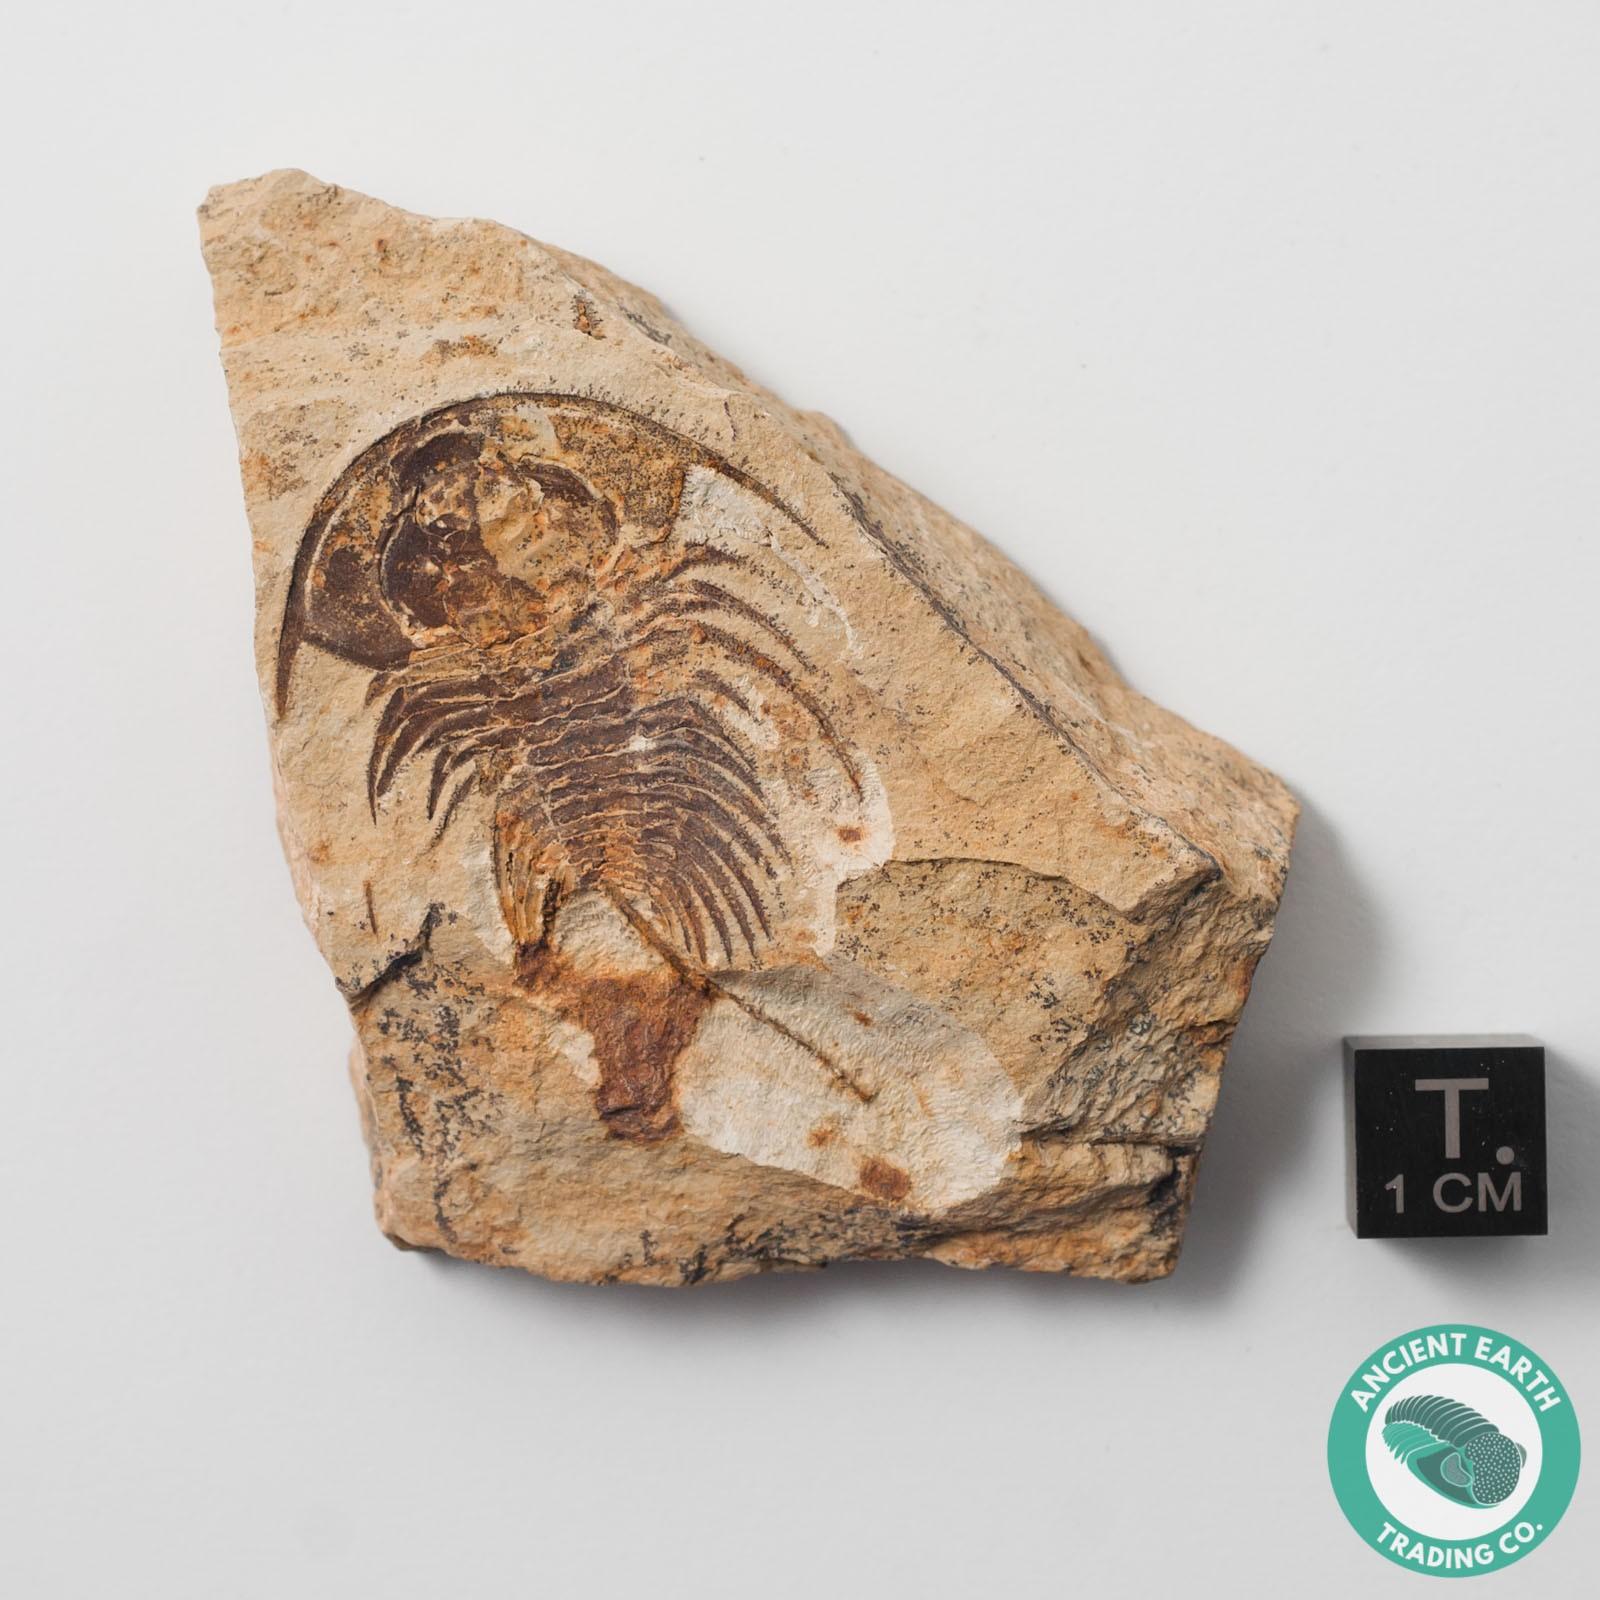 1.74 in. Rare Teresellus goldfieldensis Cambrian Trilobite Fossil - Nevada